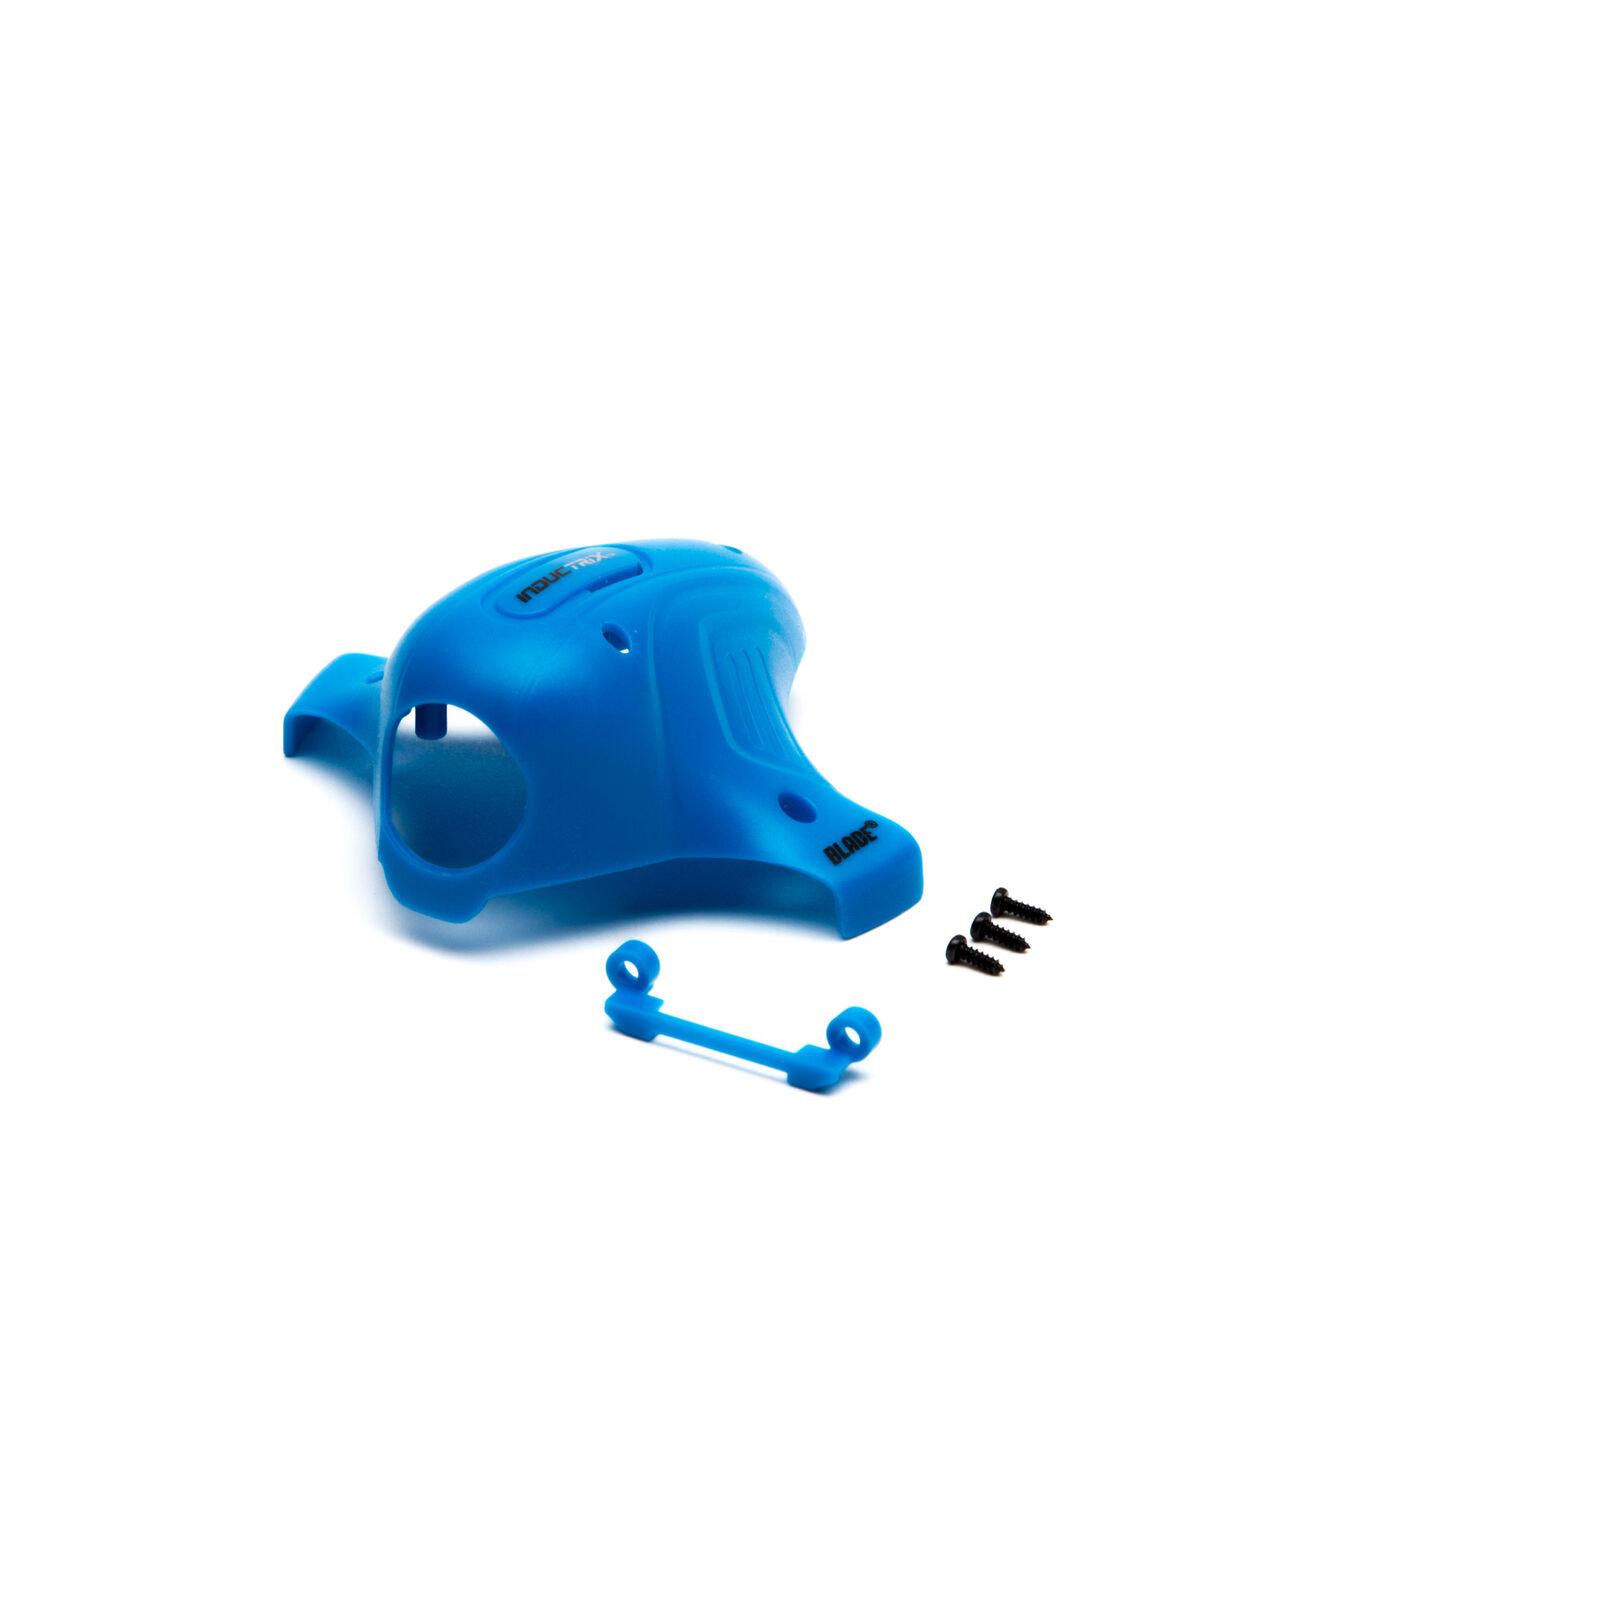 Canopy Blue: Inductrix FPV